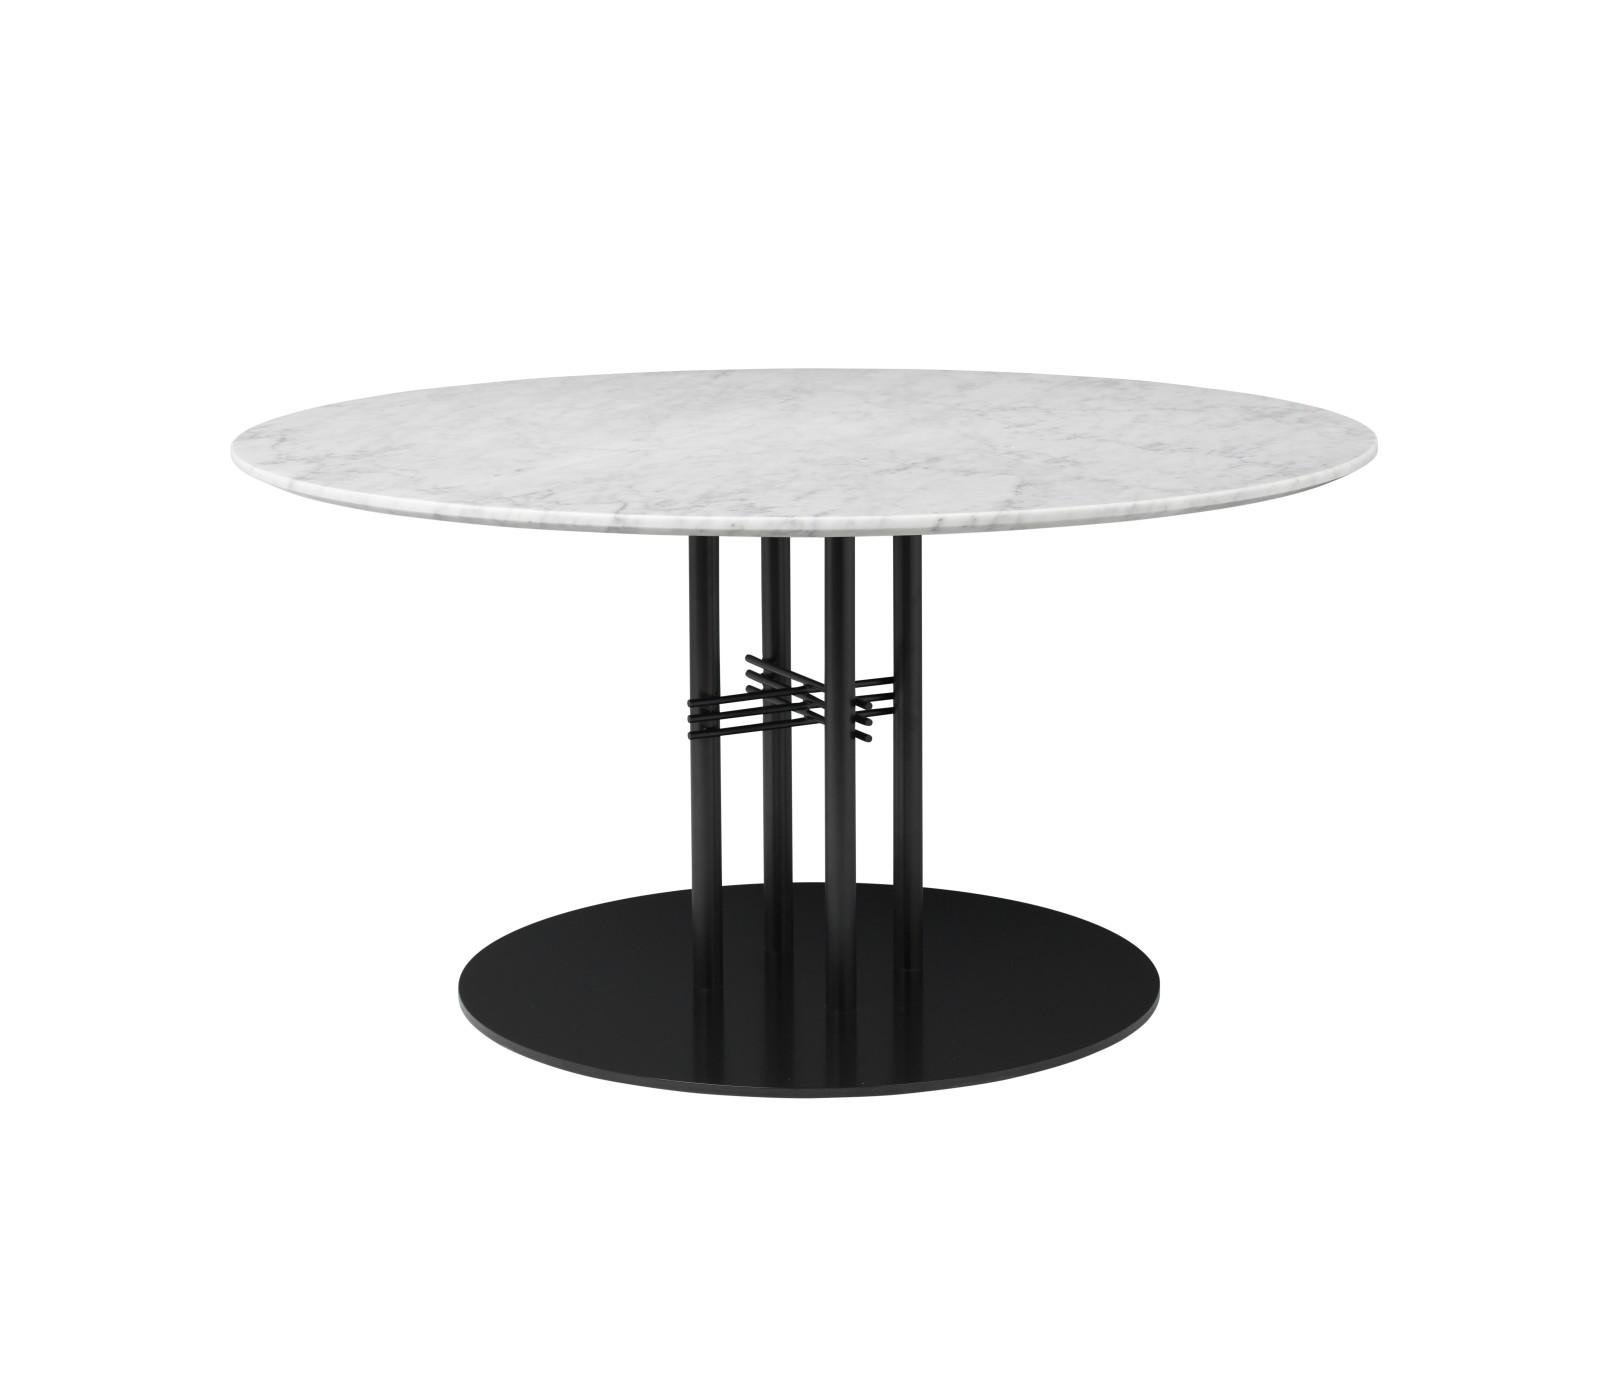 TS Column Lounge Table Marble 0110, Frame Matt Black, Gubi Marble Bianco Carrara